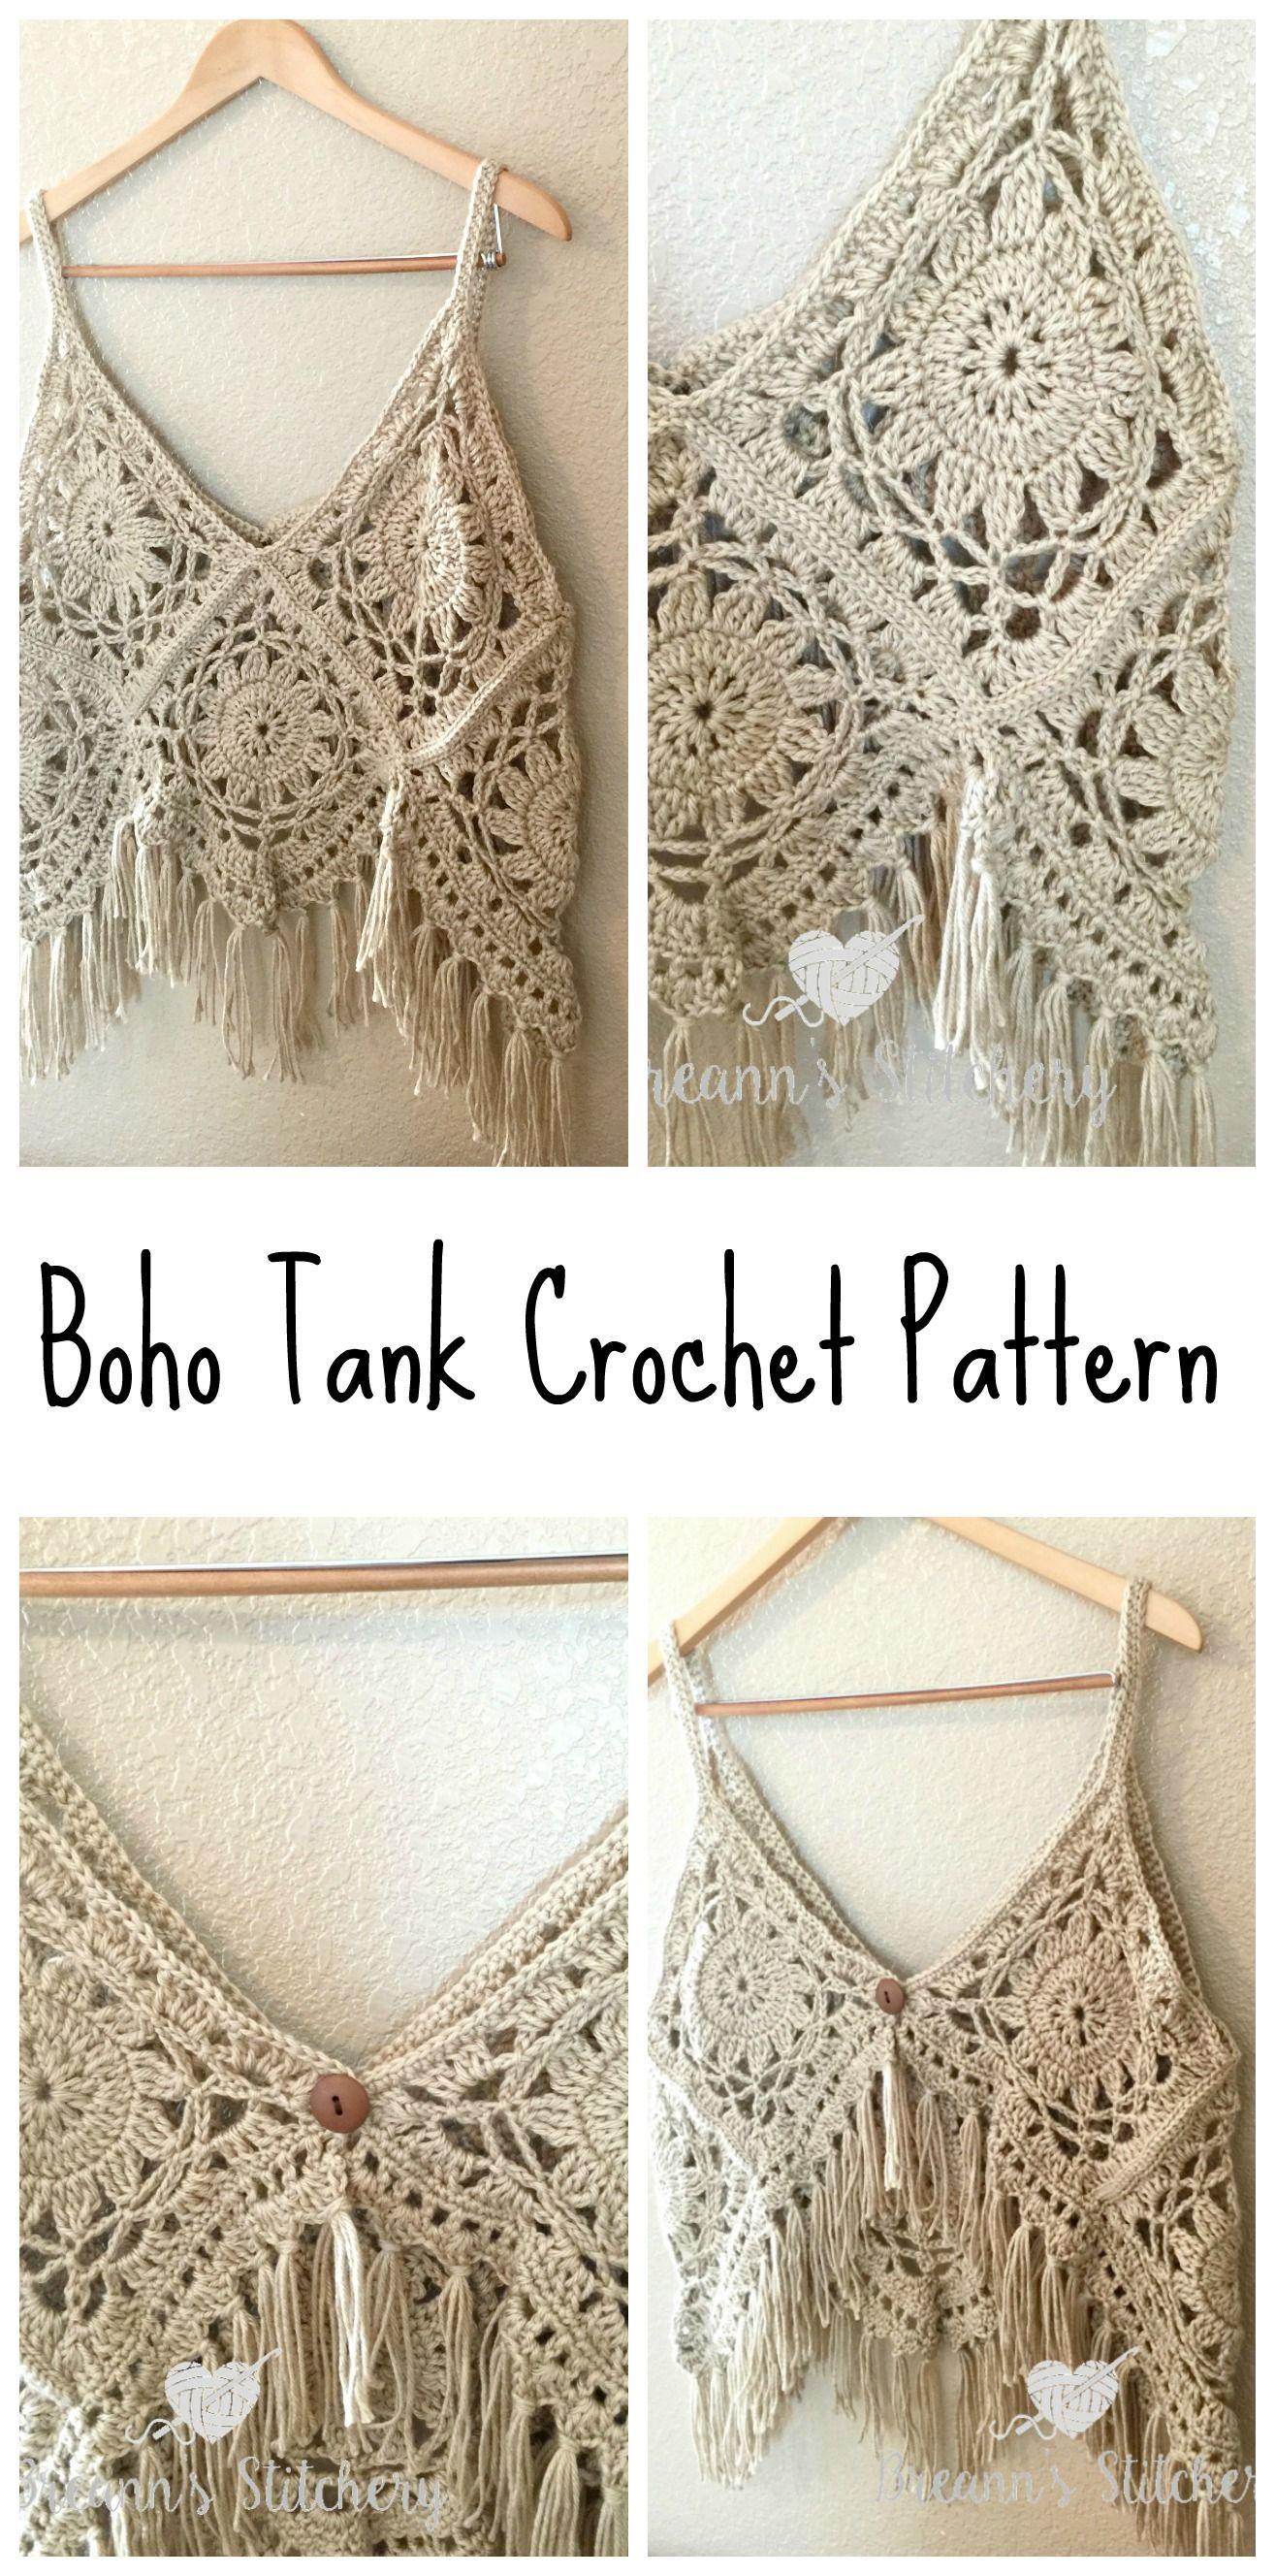 Crochet Boho Tank Top | Yarns, Crochet and Patterns